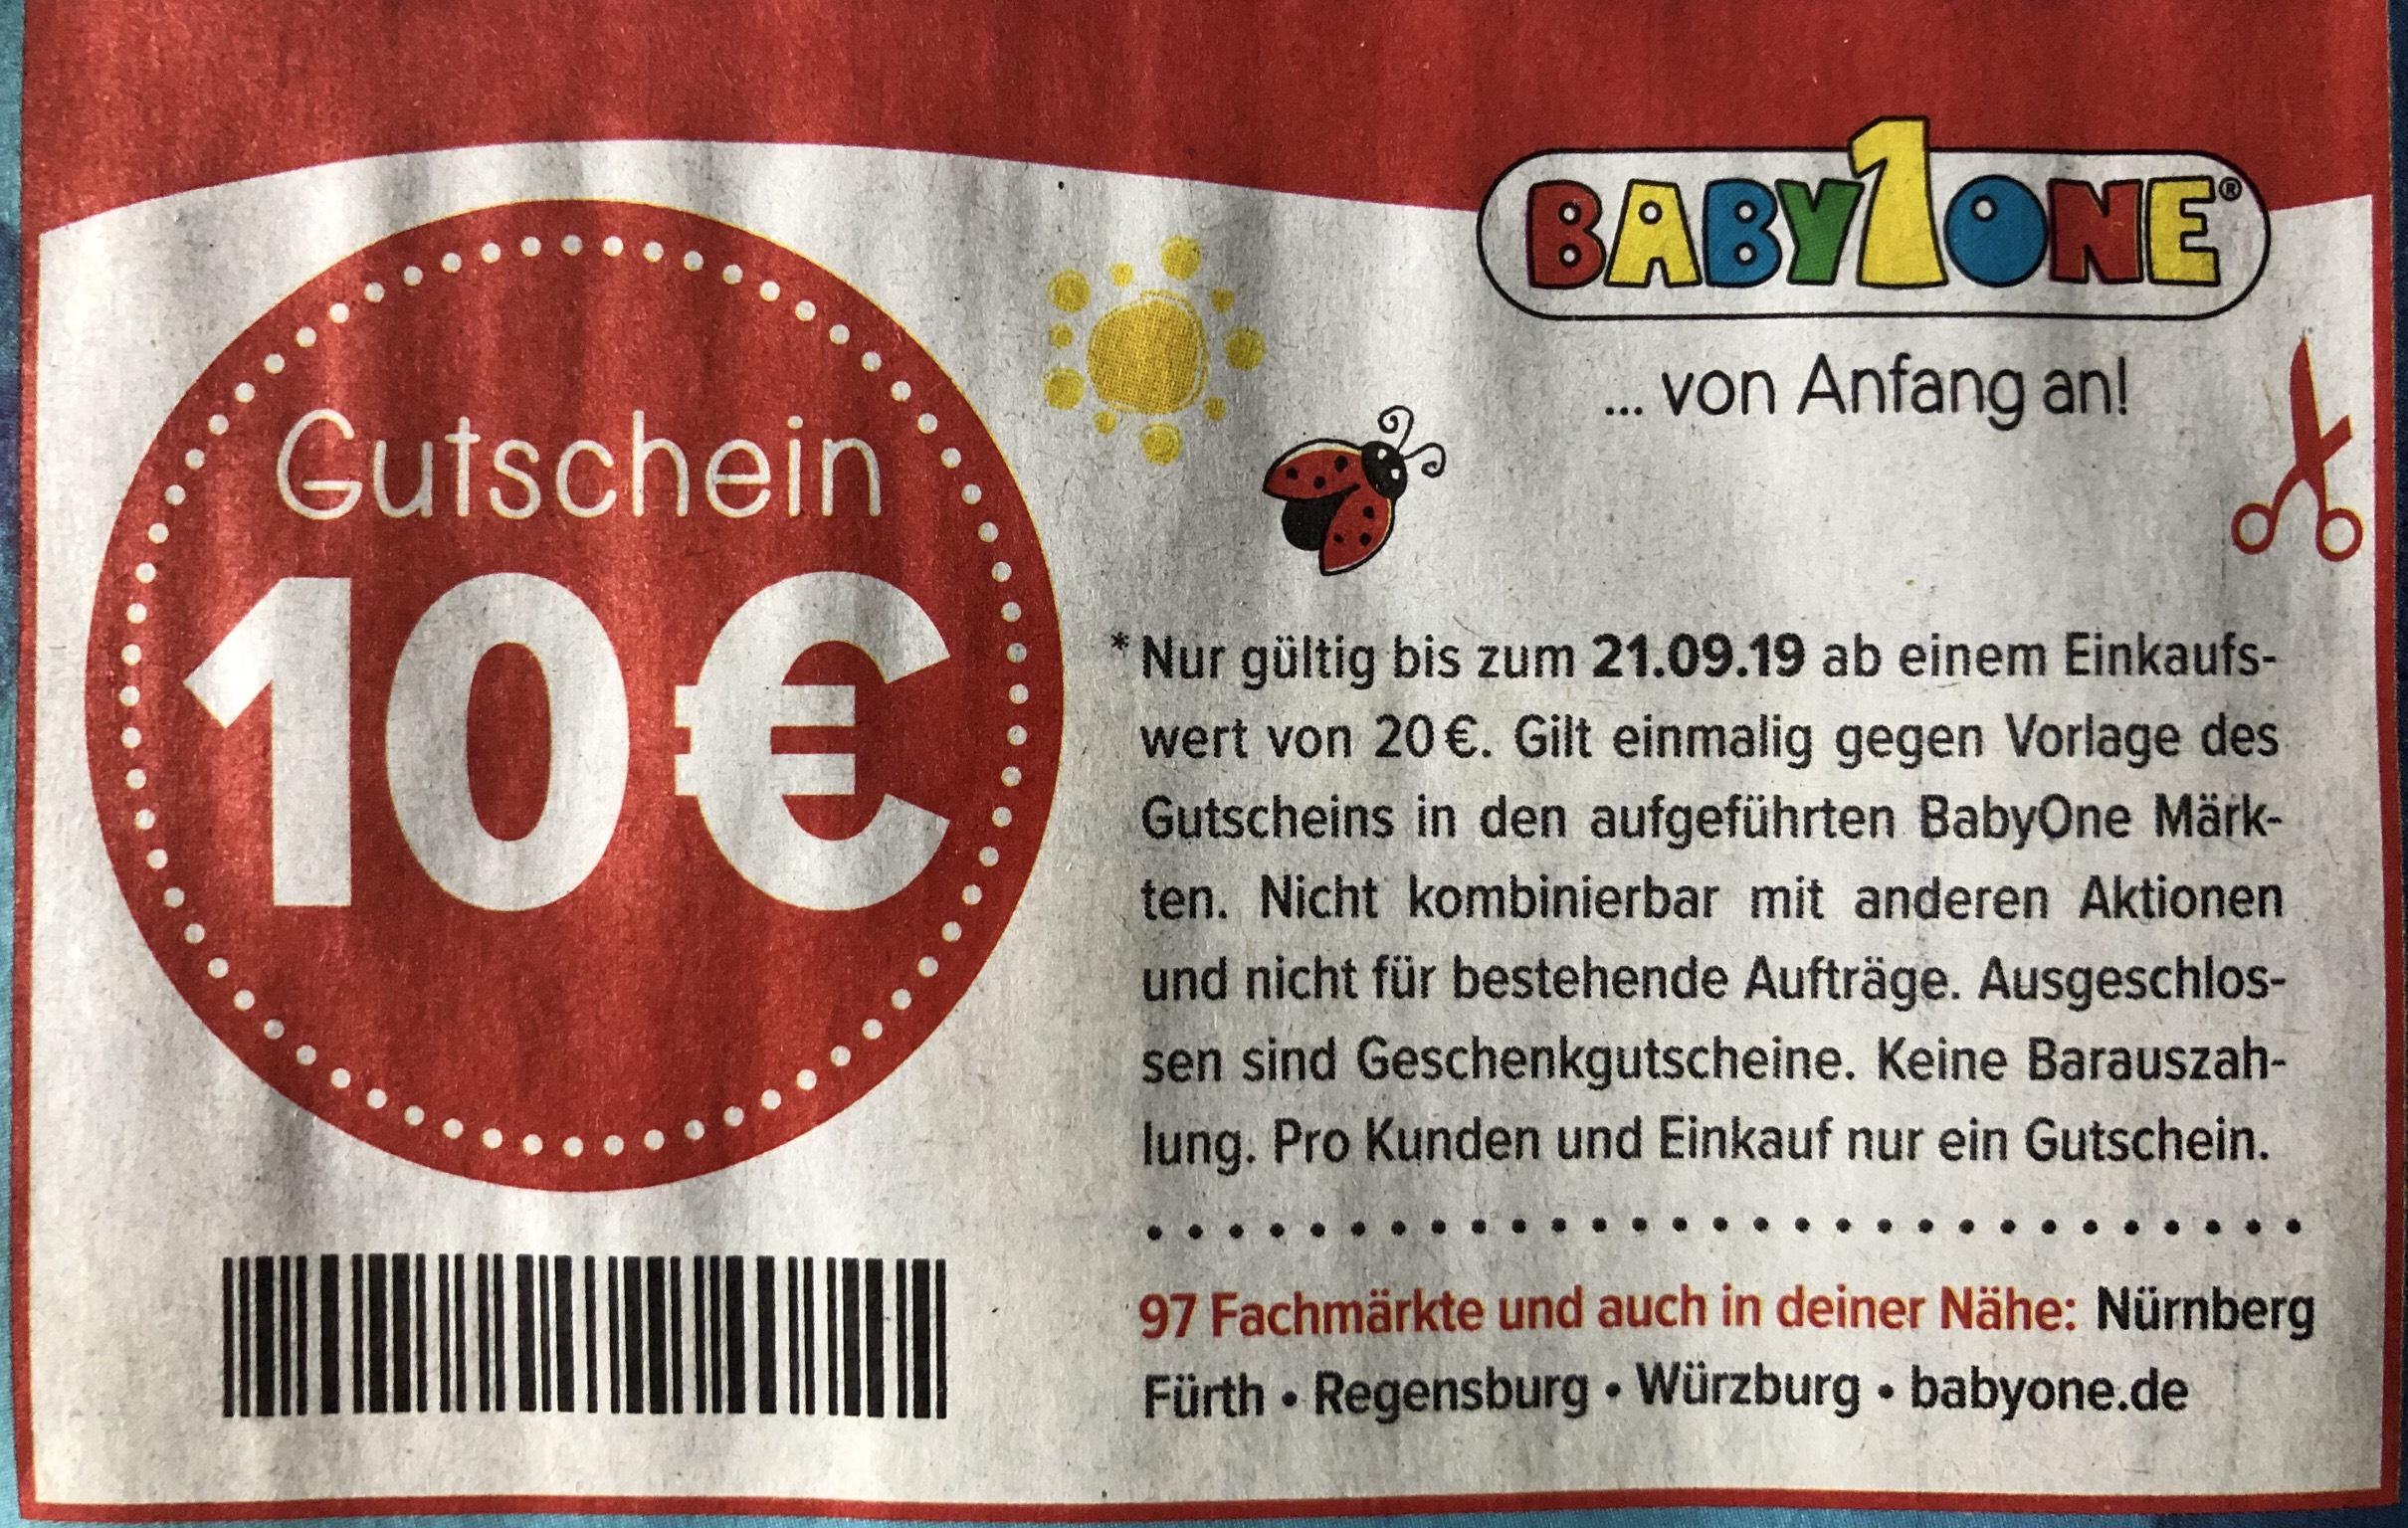 [BabyOne offline] 10 € Rabatt - MBW 20 € - Nürnberg Fürth Regensburg Würzburg